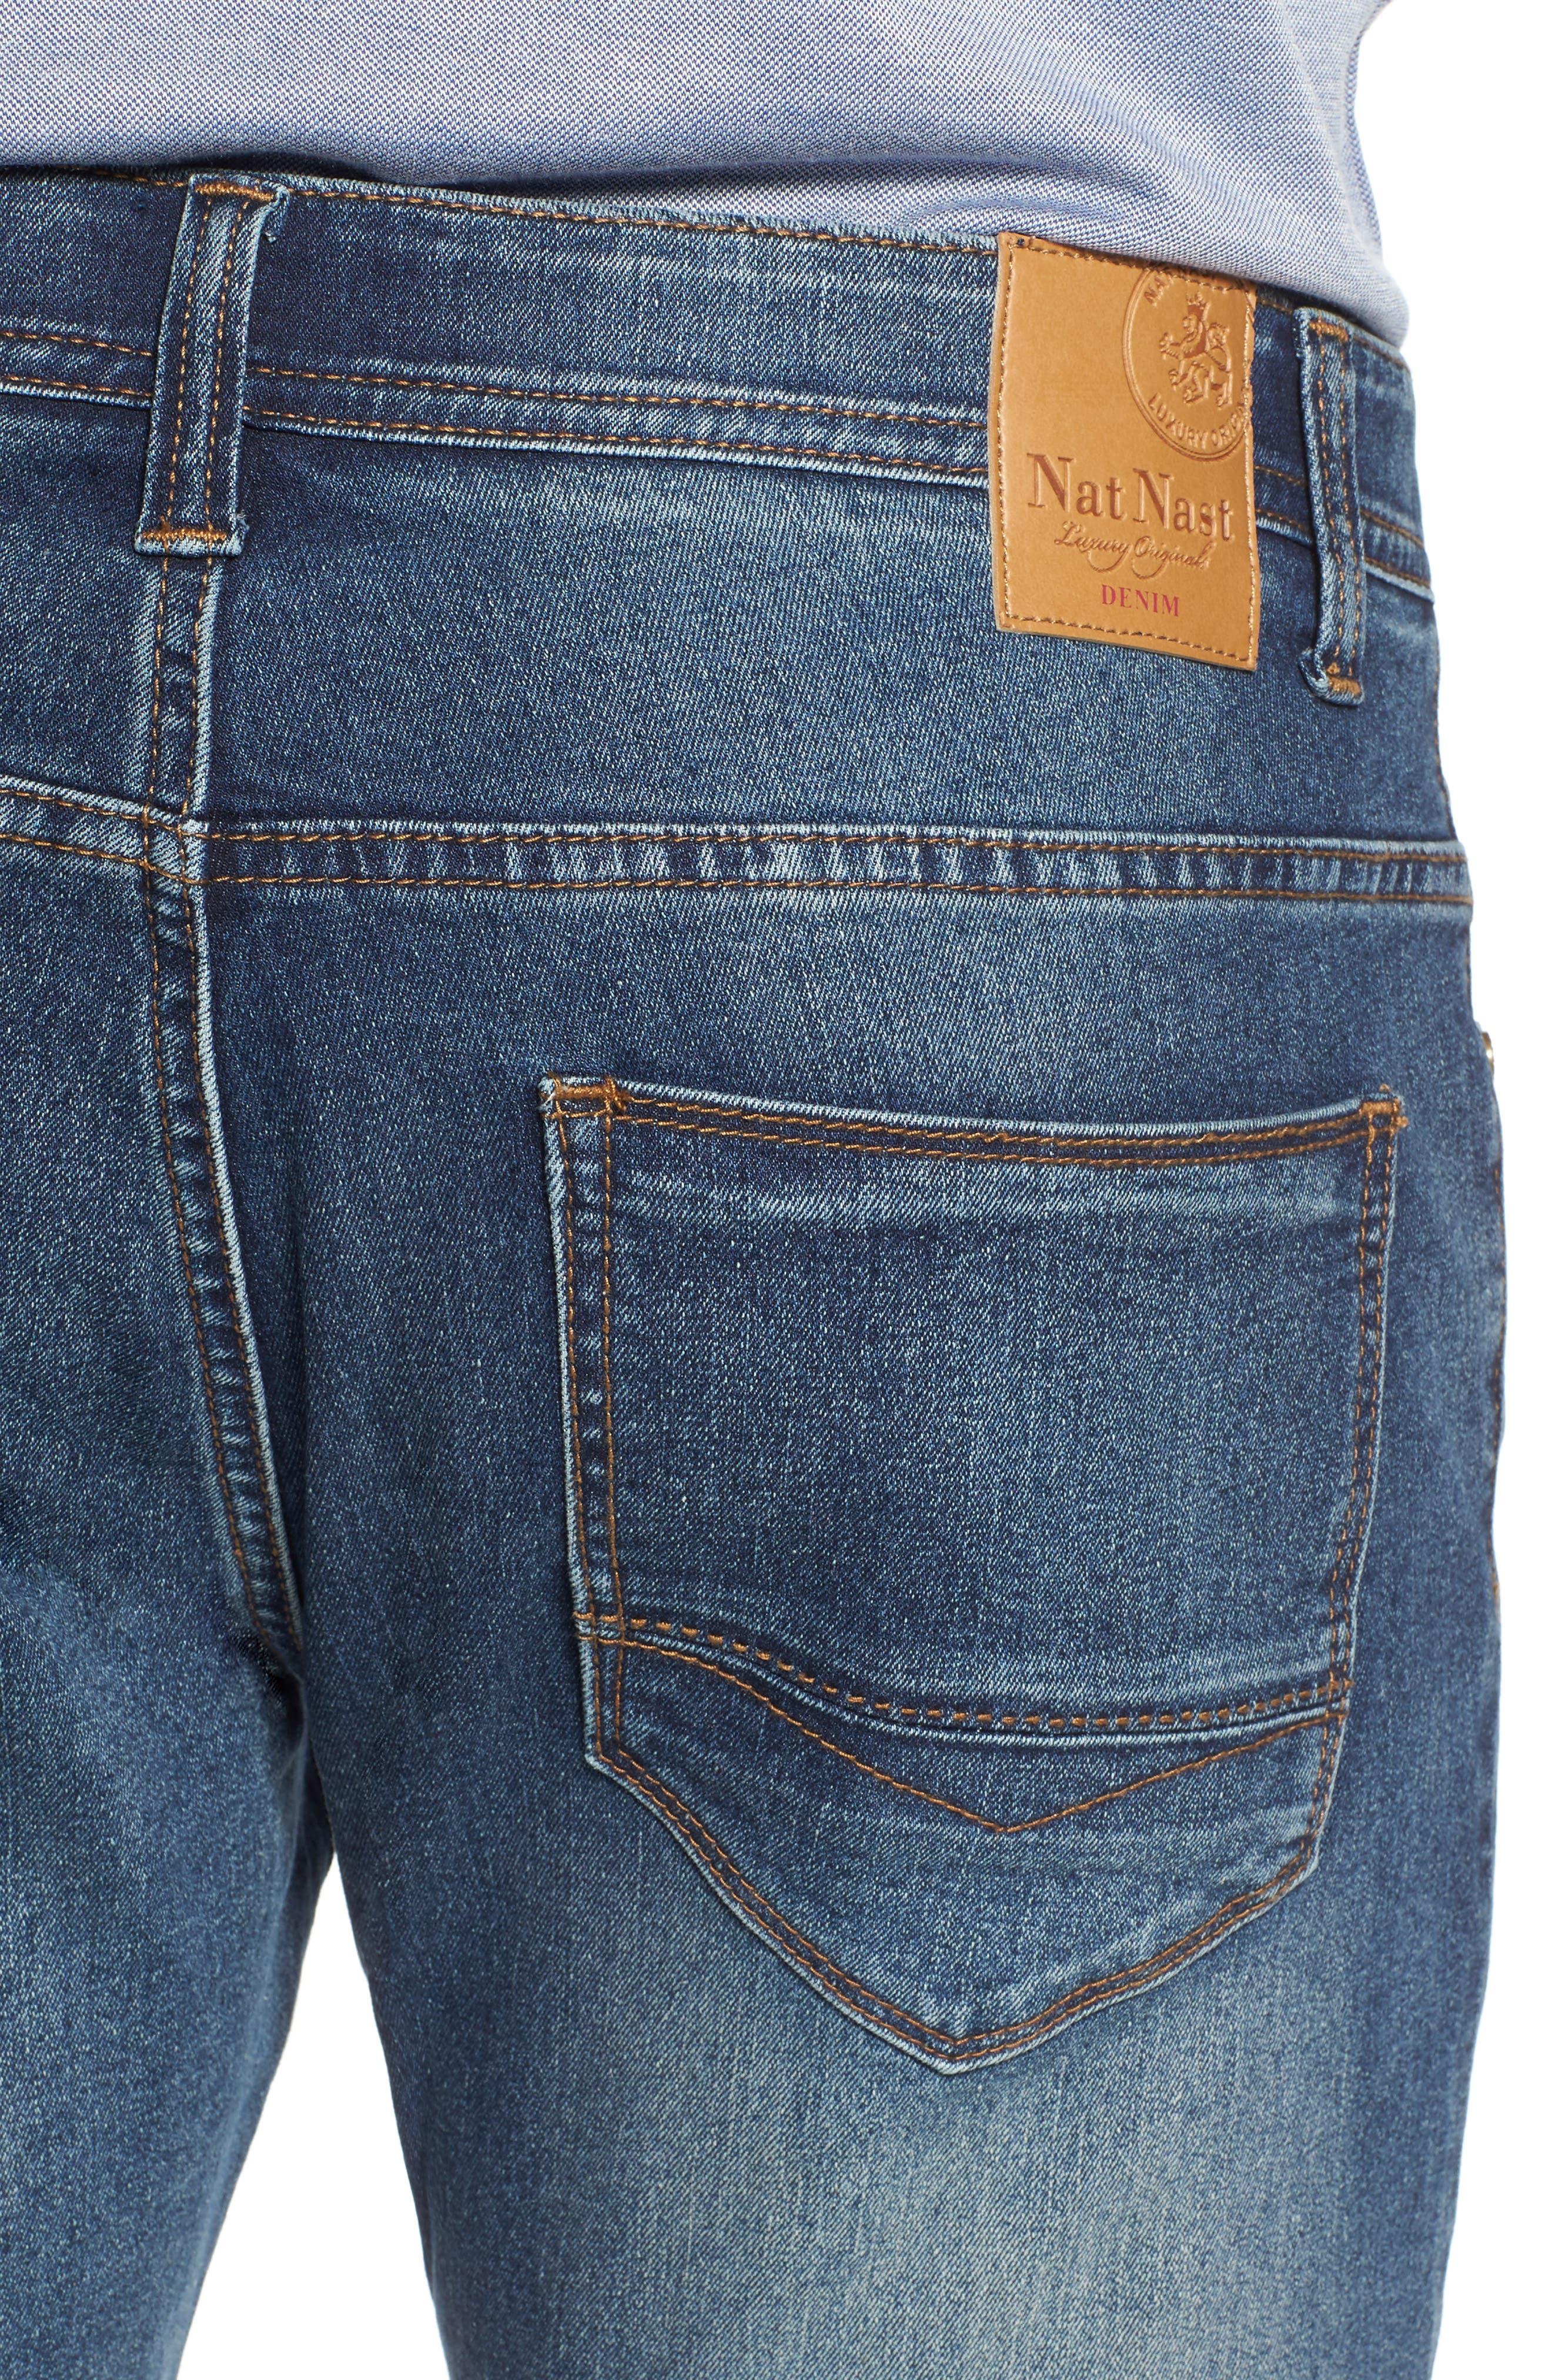 Maverick Stretch Slim Fit Jeans,                             Alternate thumbnail 4, color,                             MAVERICK WASH